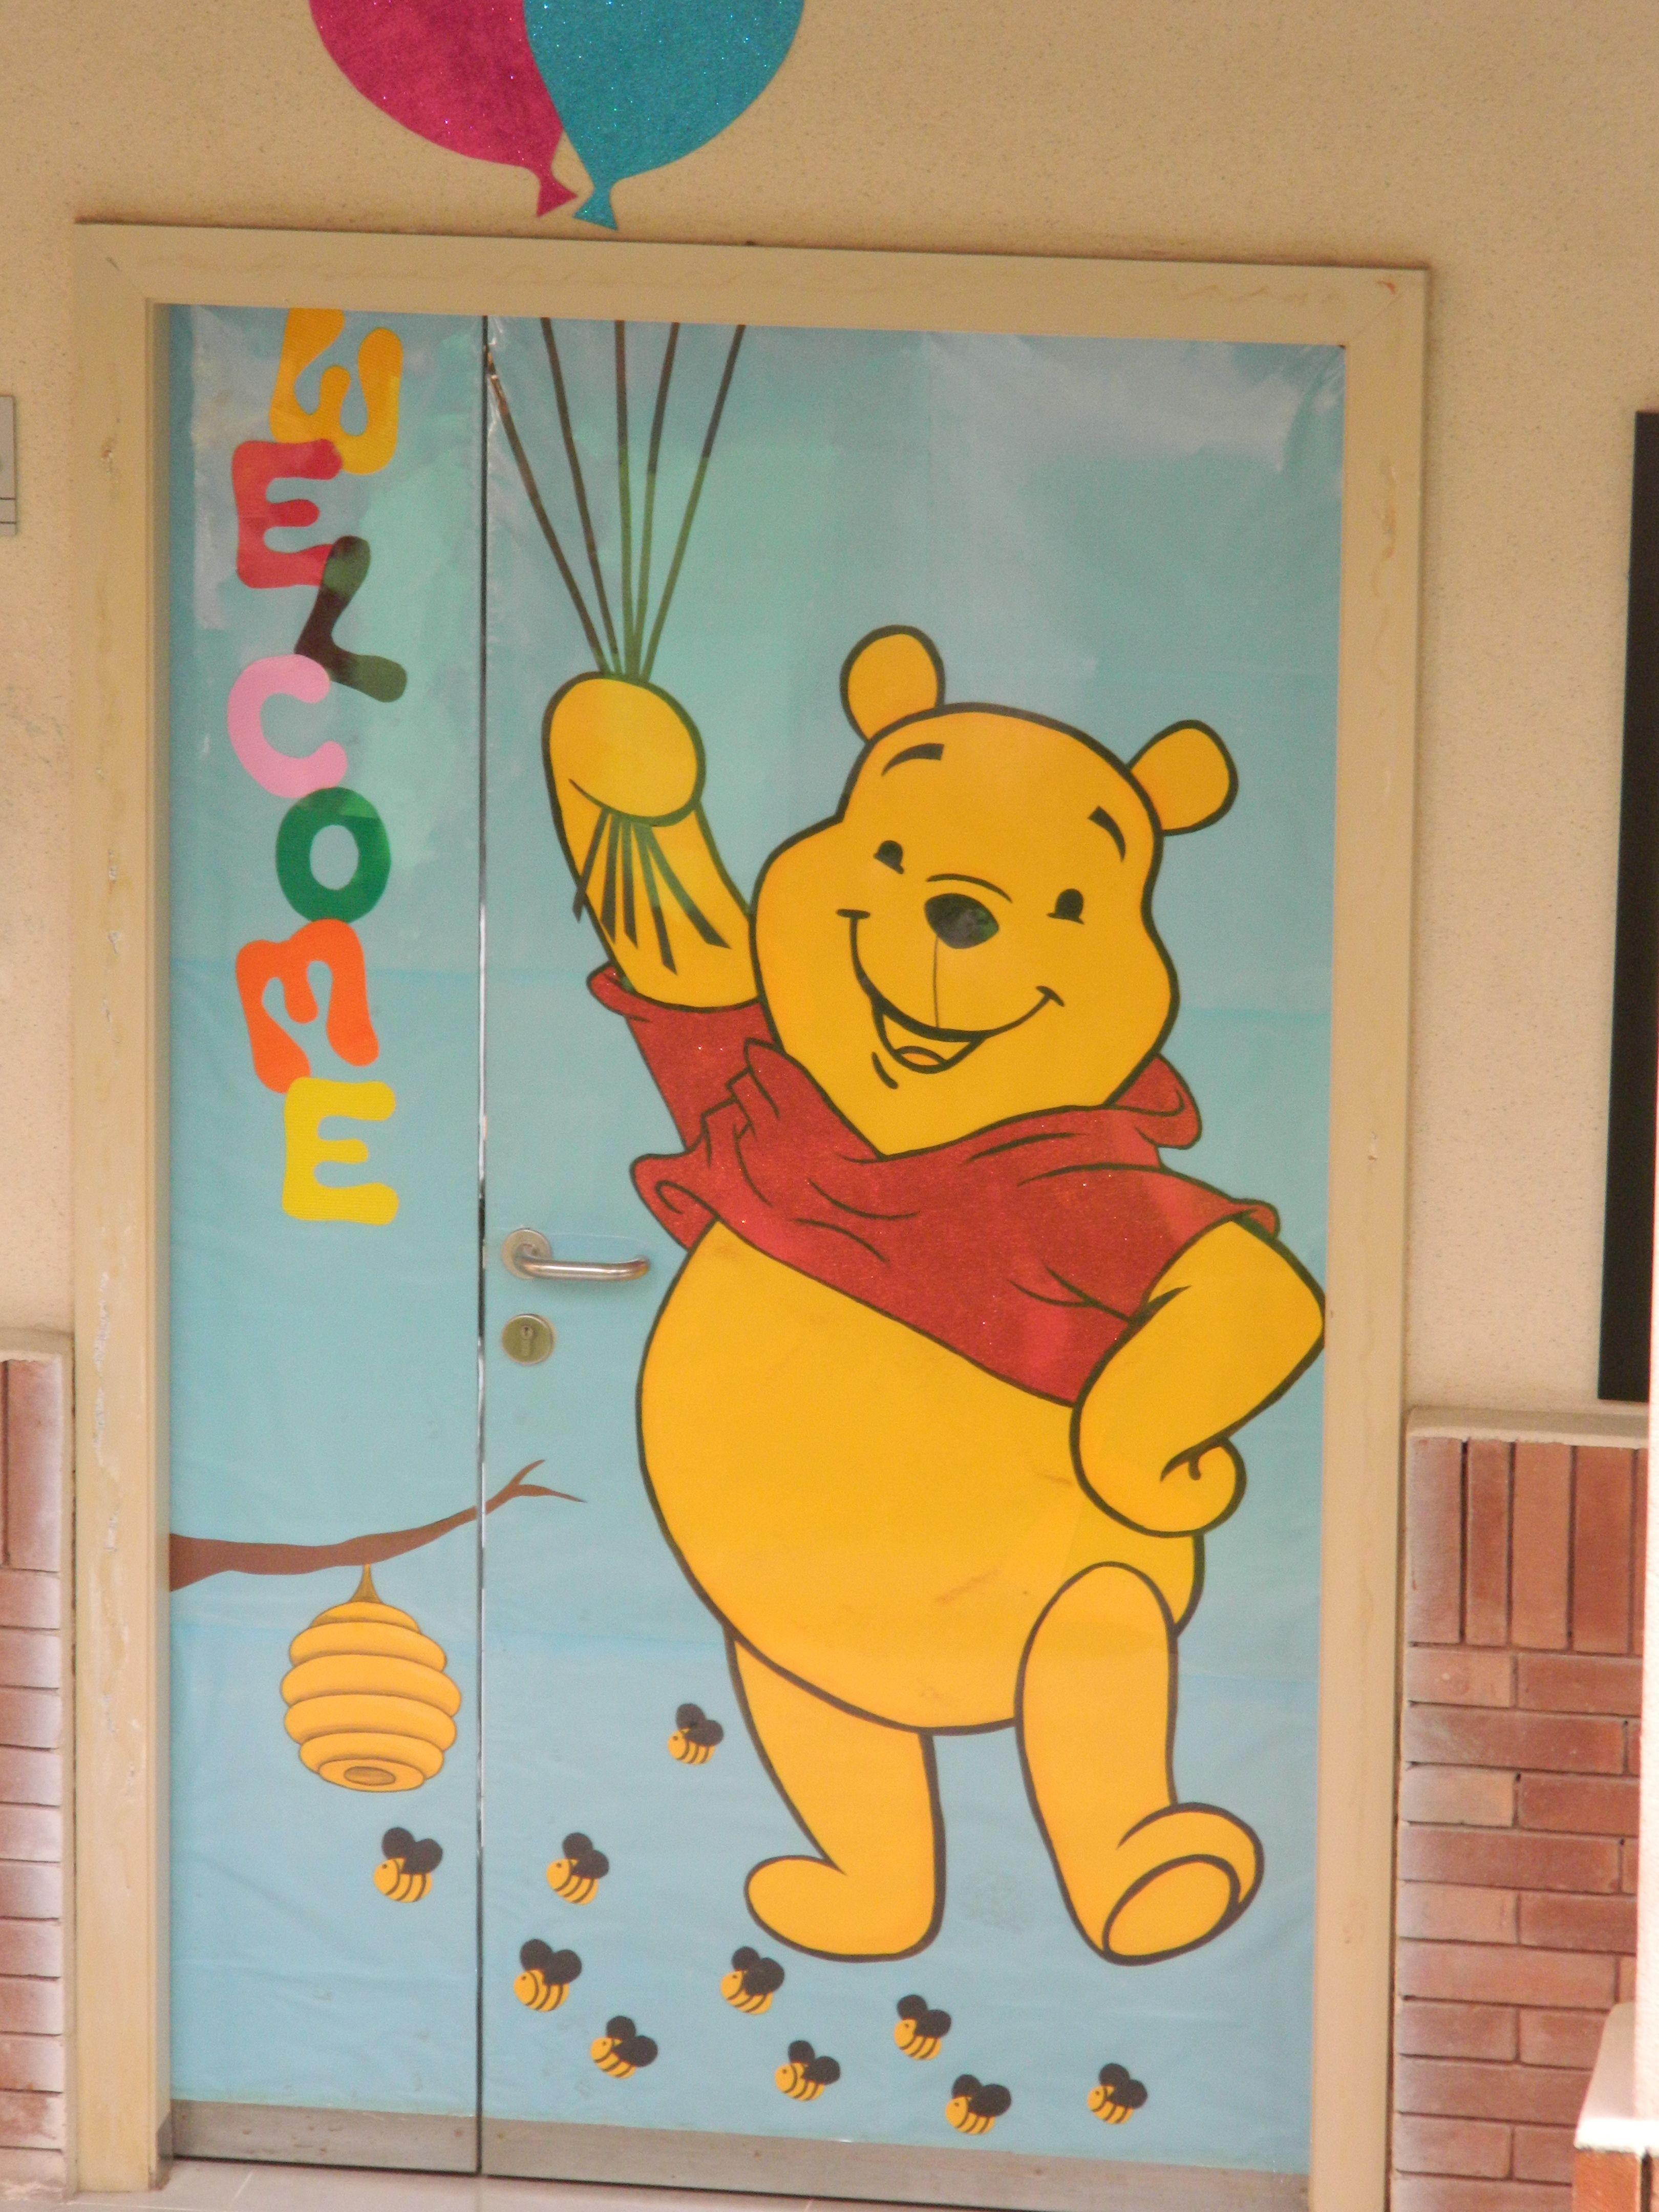 pooh bear door | bulletin boards and doors | Pinterest | Bulletin board